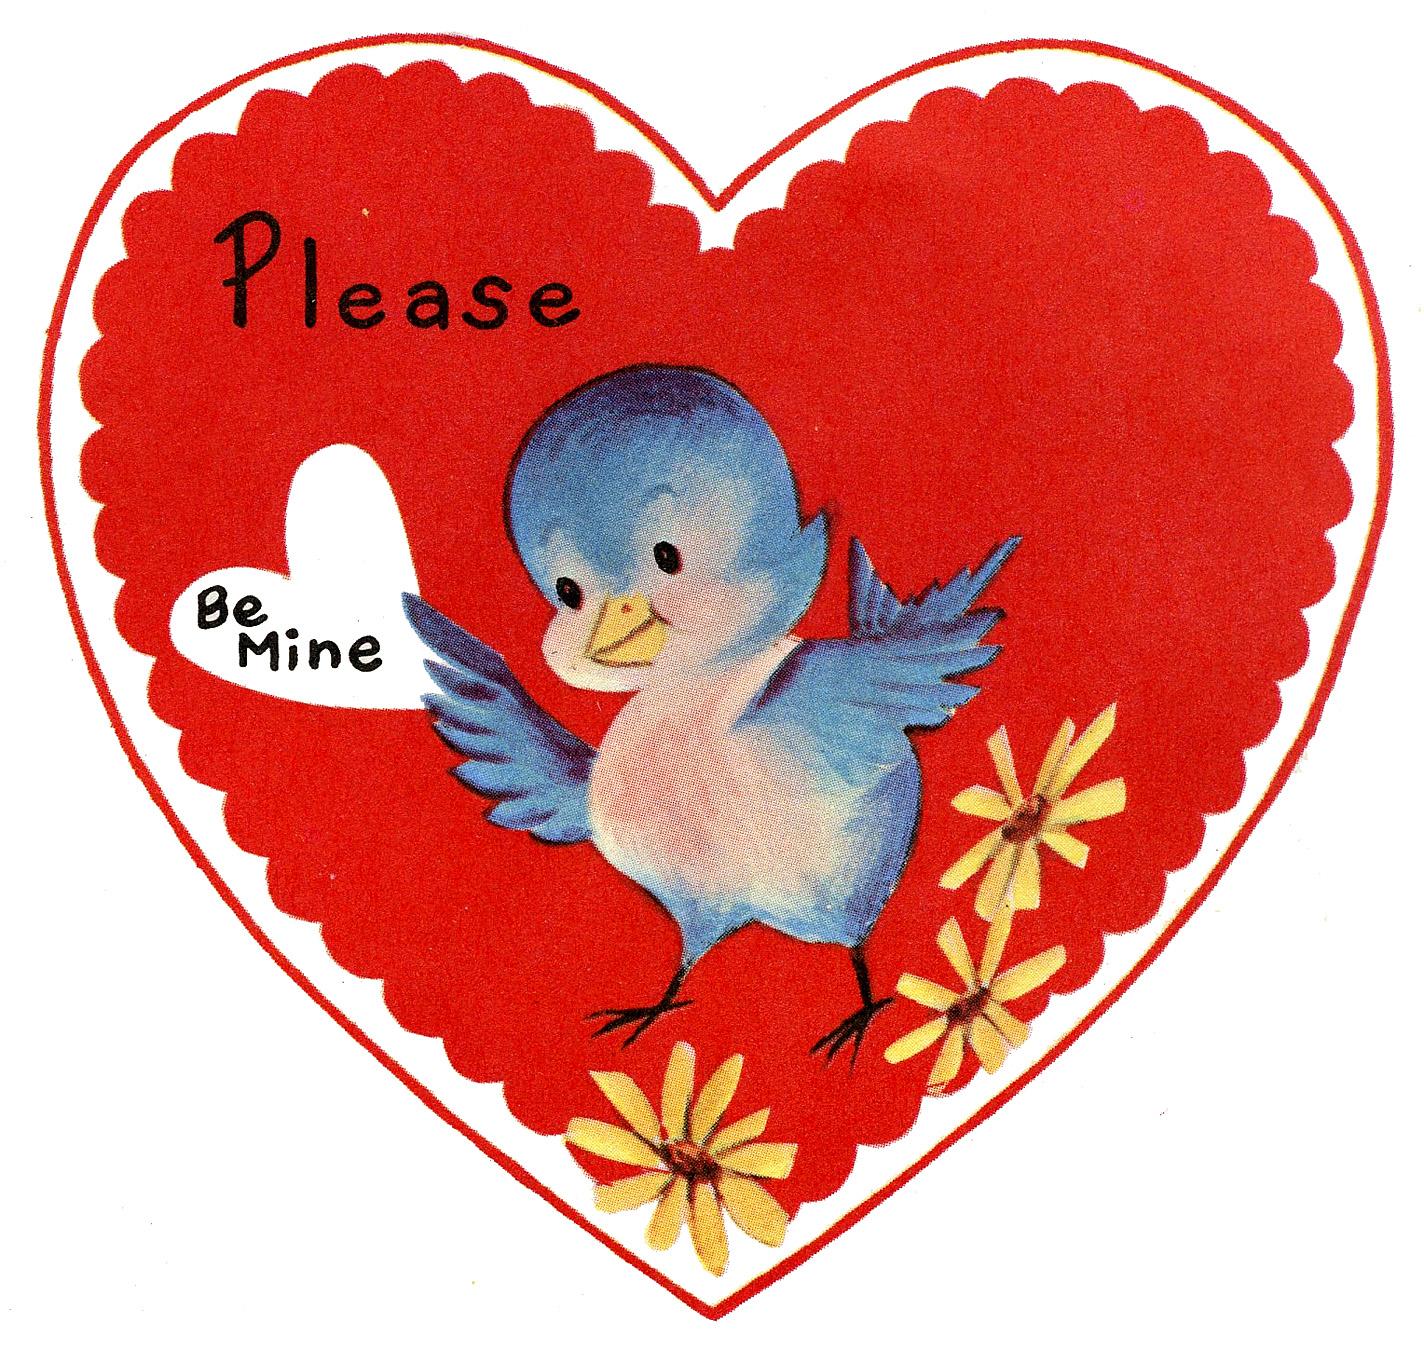 Retro Valentine Image Cute Lil Bluebird The Graphics Fairy